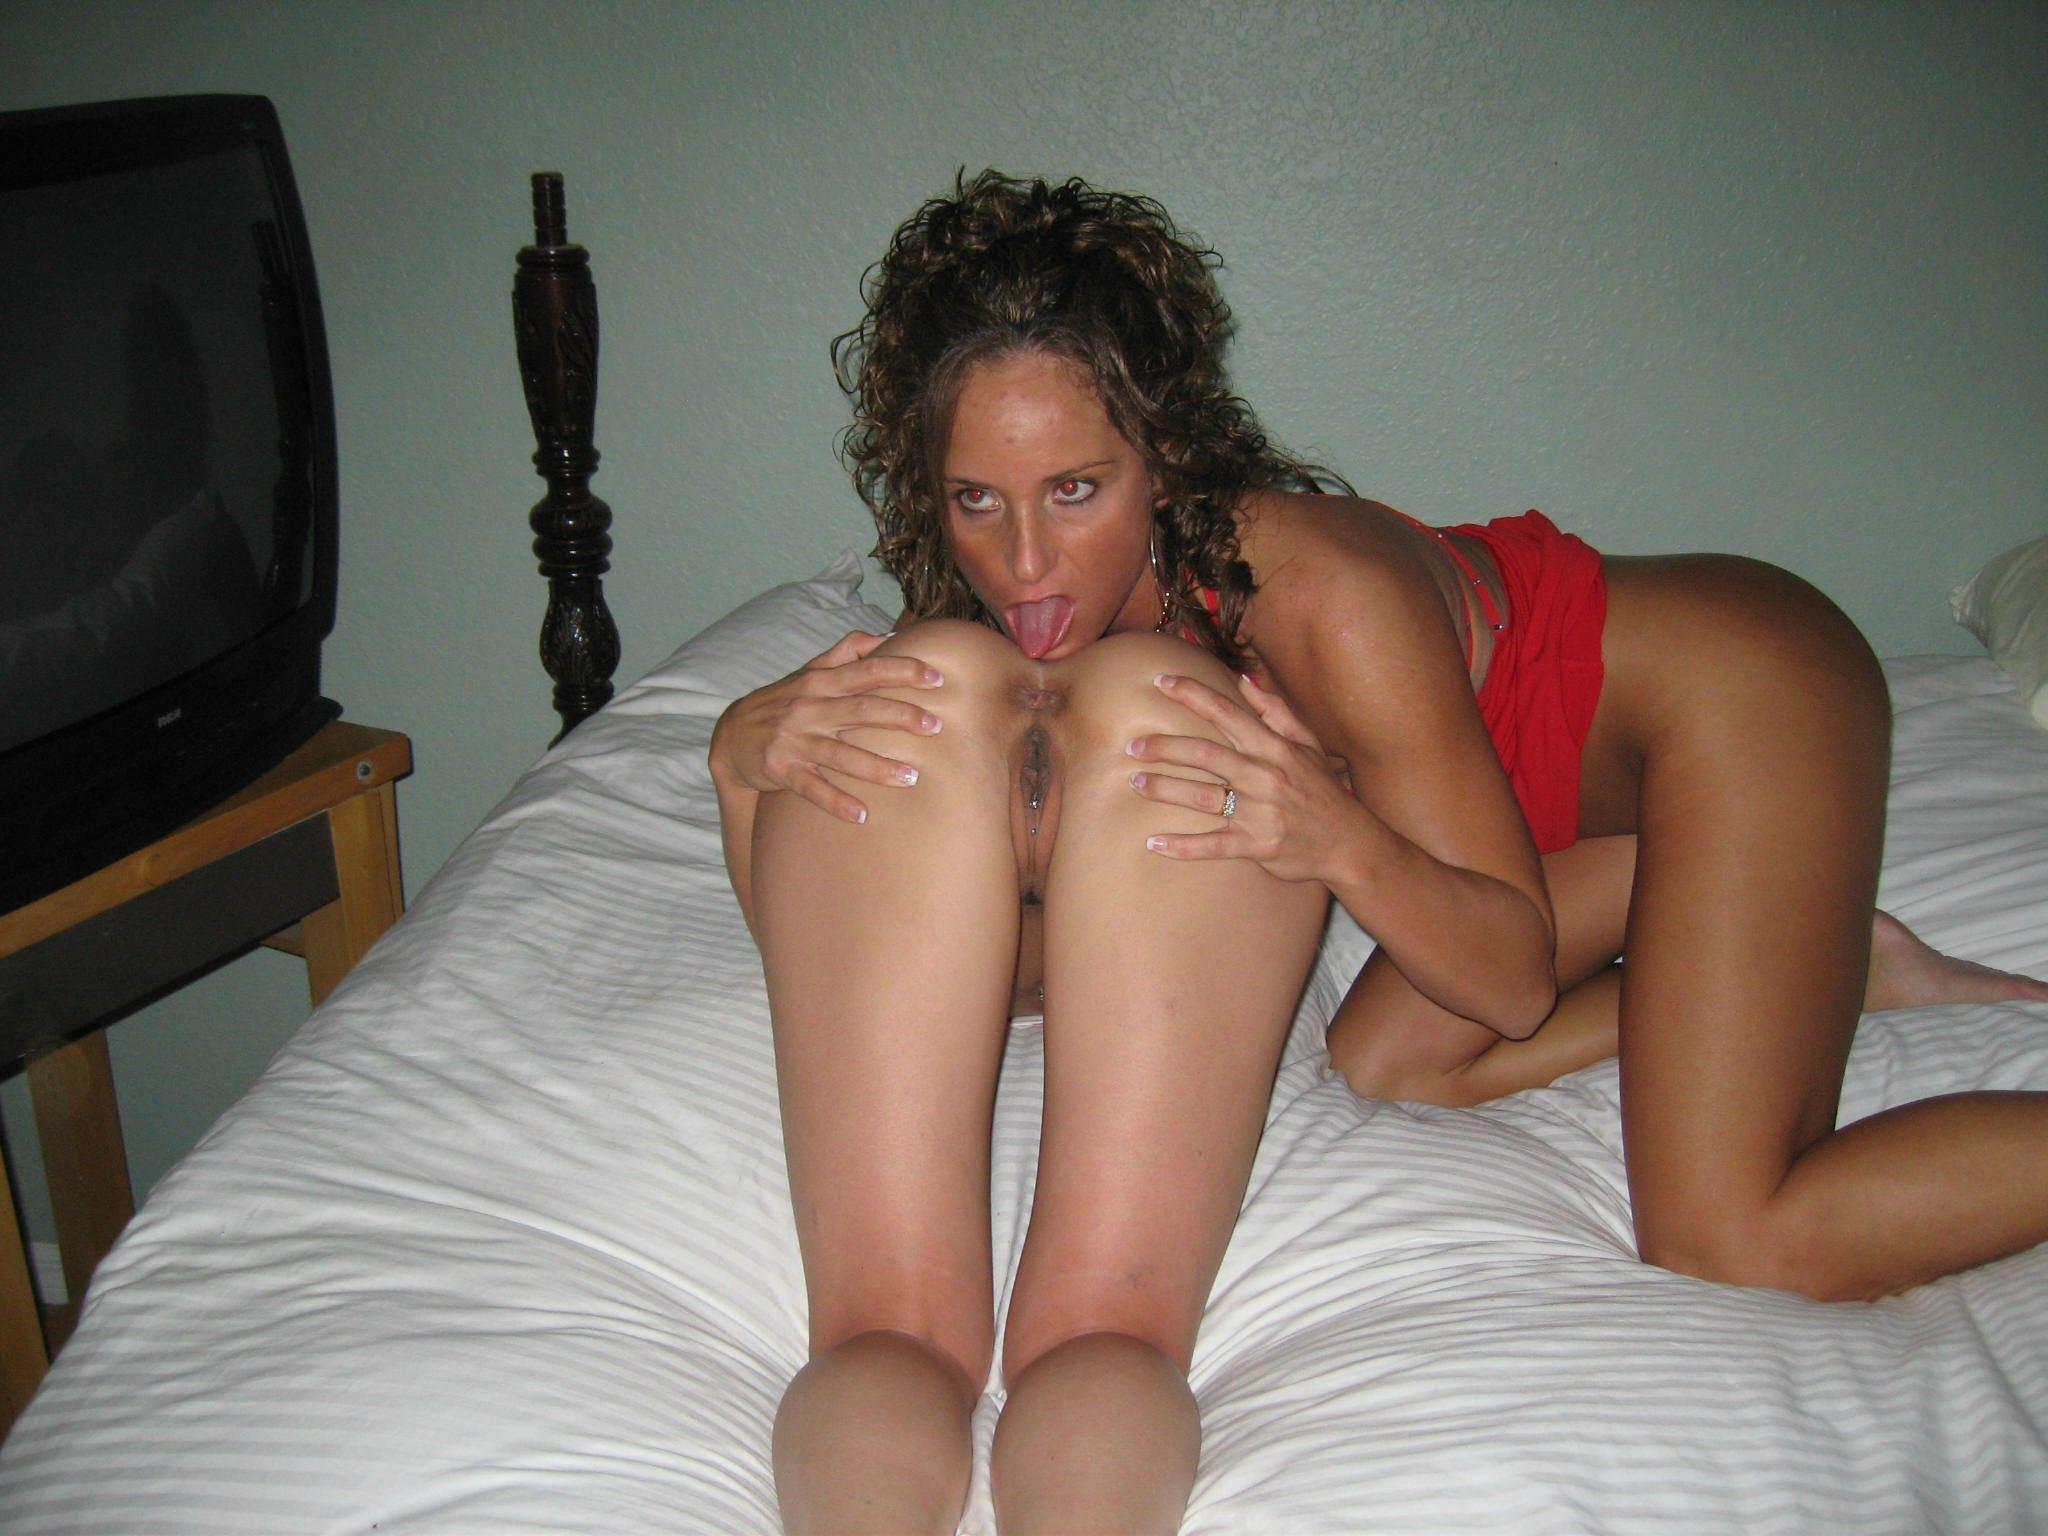 Canine reccomend Milf nude lesbian swinger pics